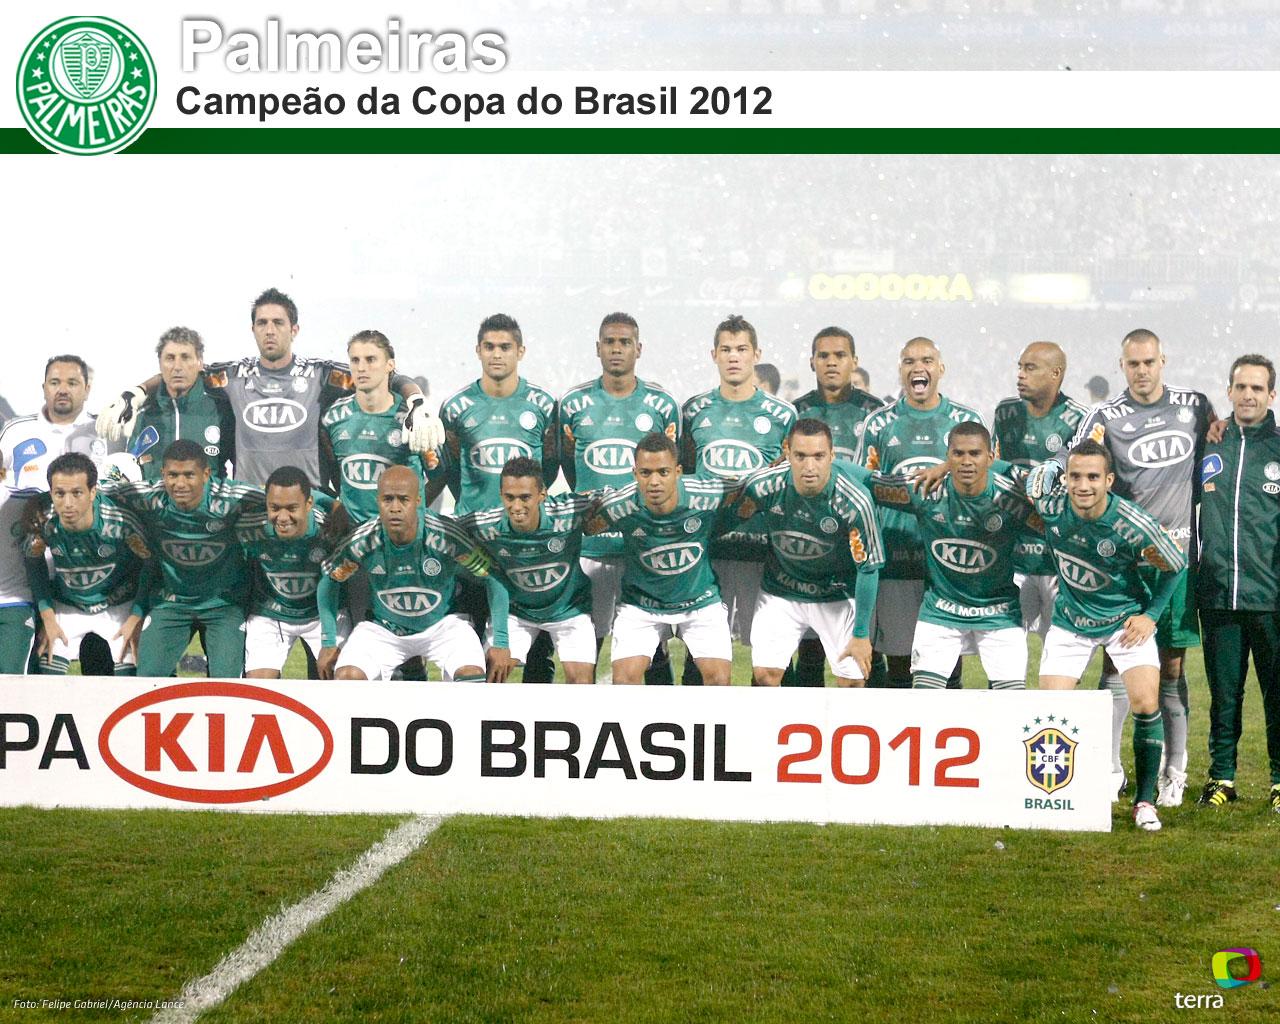 http://4.bp.blogspot.com/-F0-u8Lg8i6s/T_5GCaaMCTI/AAAAAAAACXQ/6bKFqZOqpM8/s1600/Palmeiras+campe%C3%A3o+da+Copa+do+brasil+wallpaper-1280.jpg